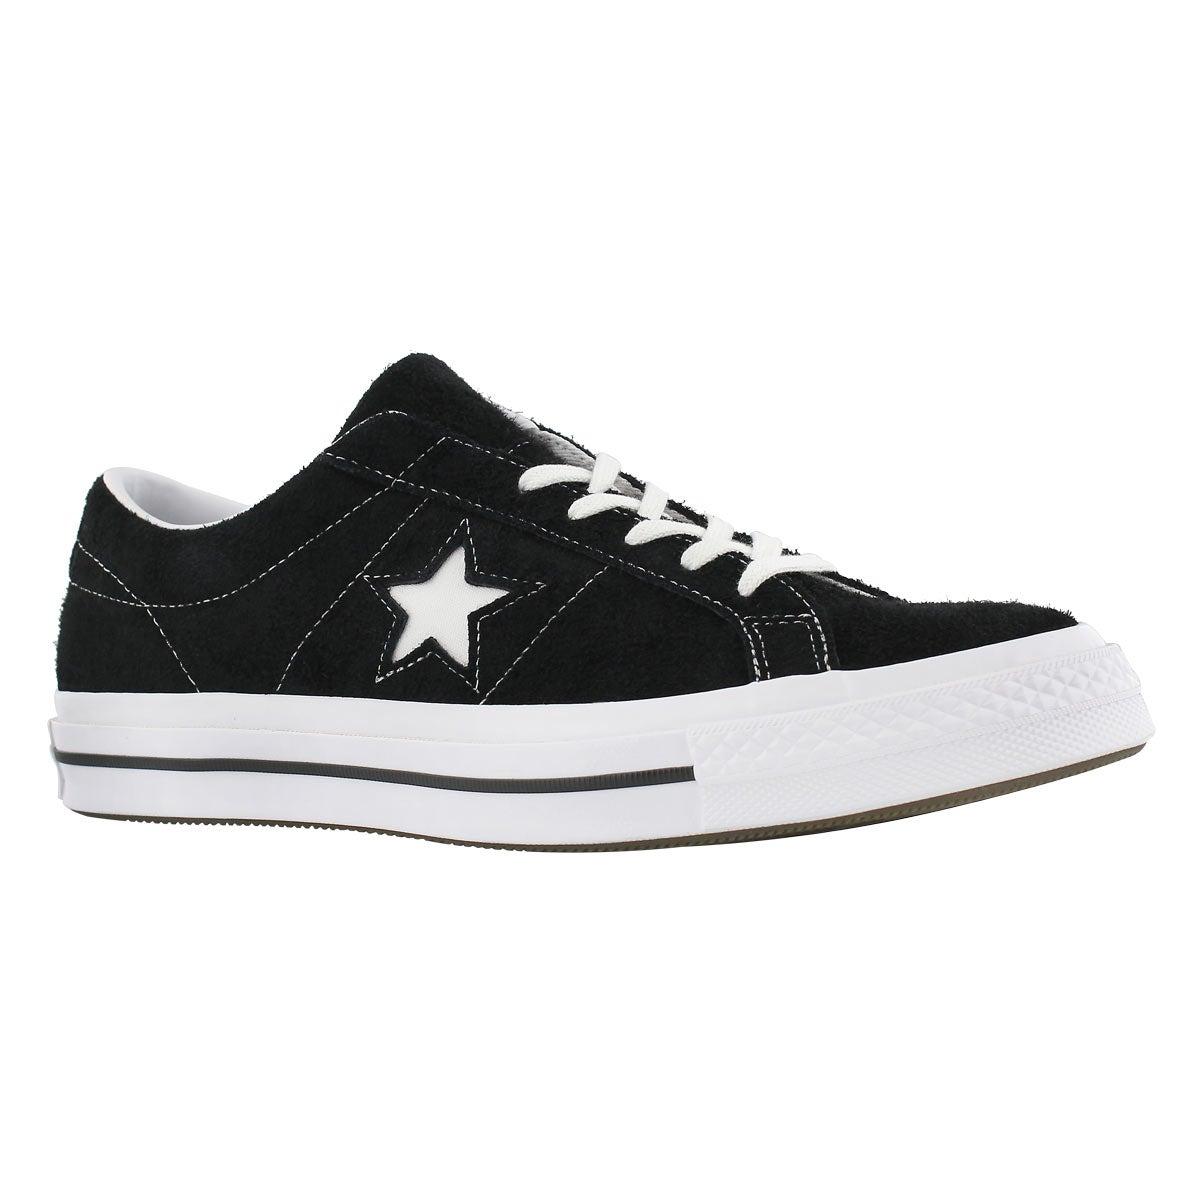 Men's ONE STAR black fashion sneakers